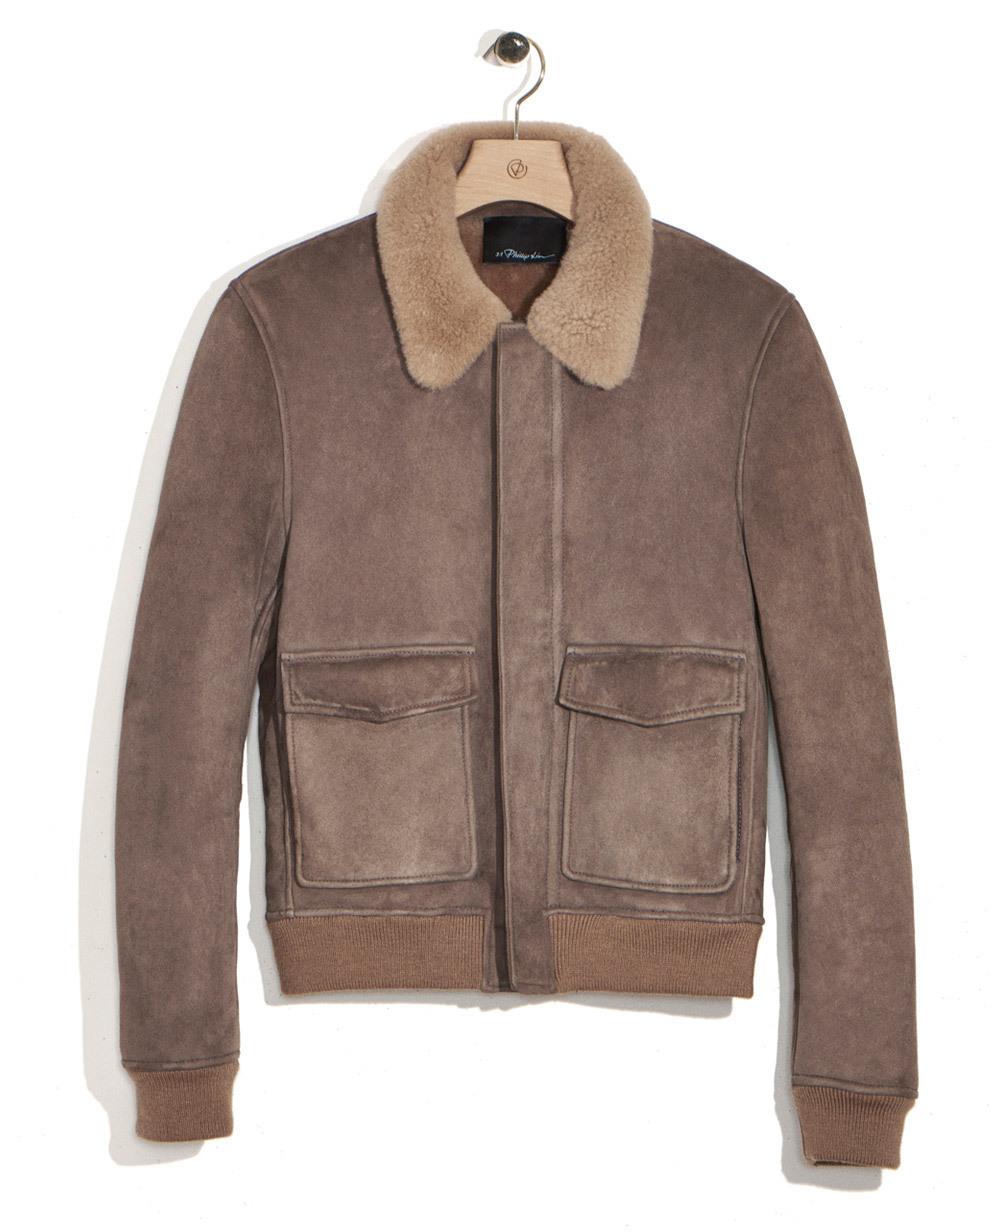 31-phillip-lim-fall-2016-shearling-bomber-jacket